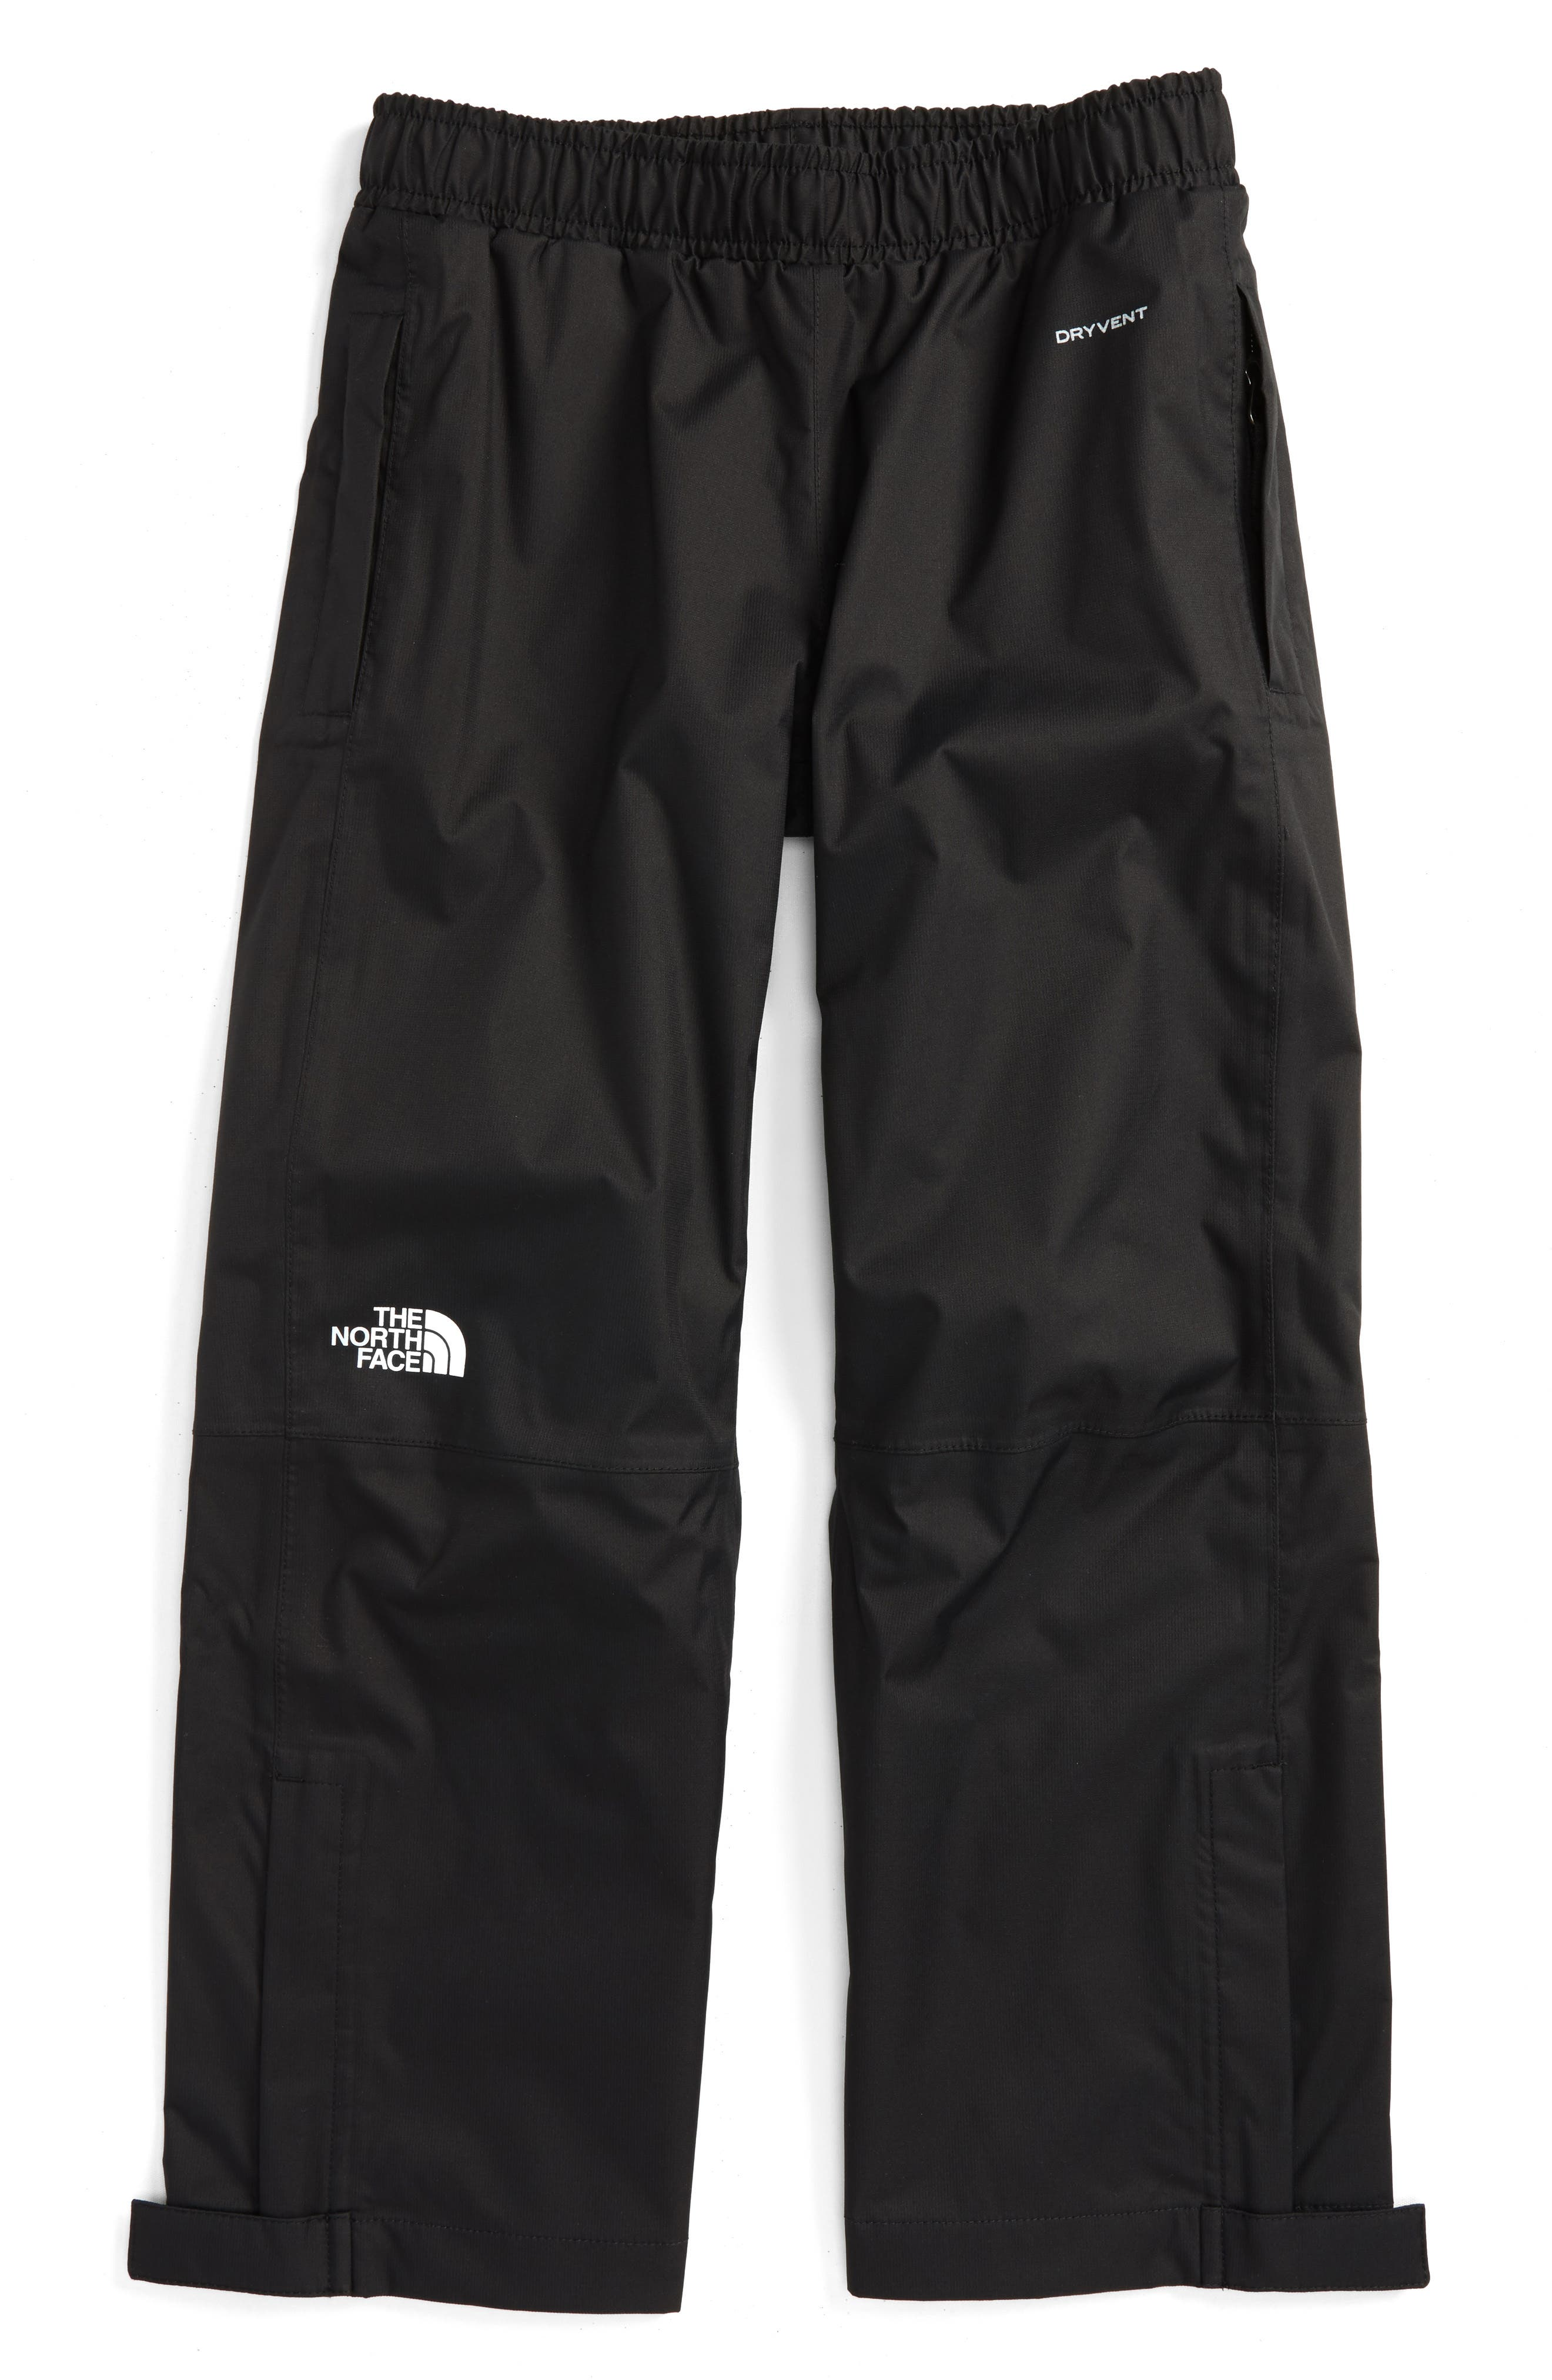 The North Face 'Resolve' Waterproof Rain Pants (Little Boys)